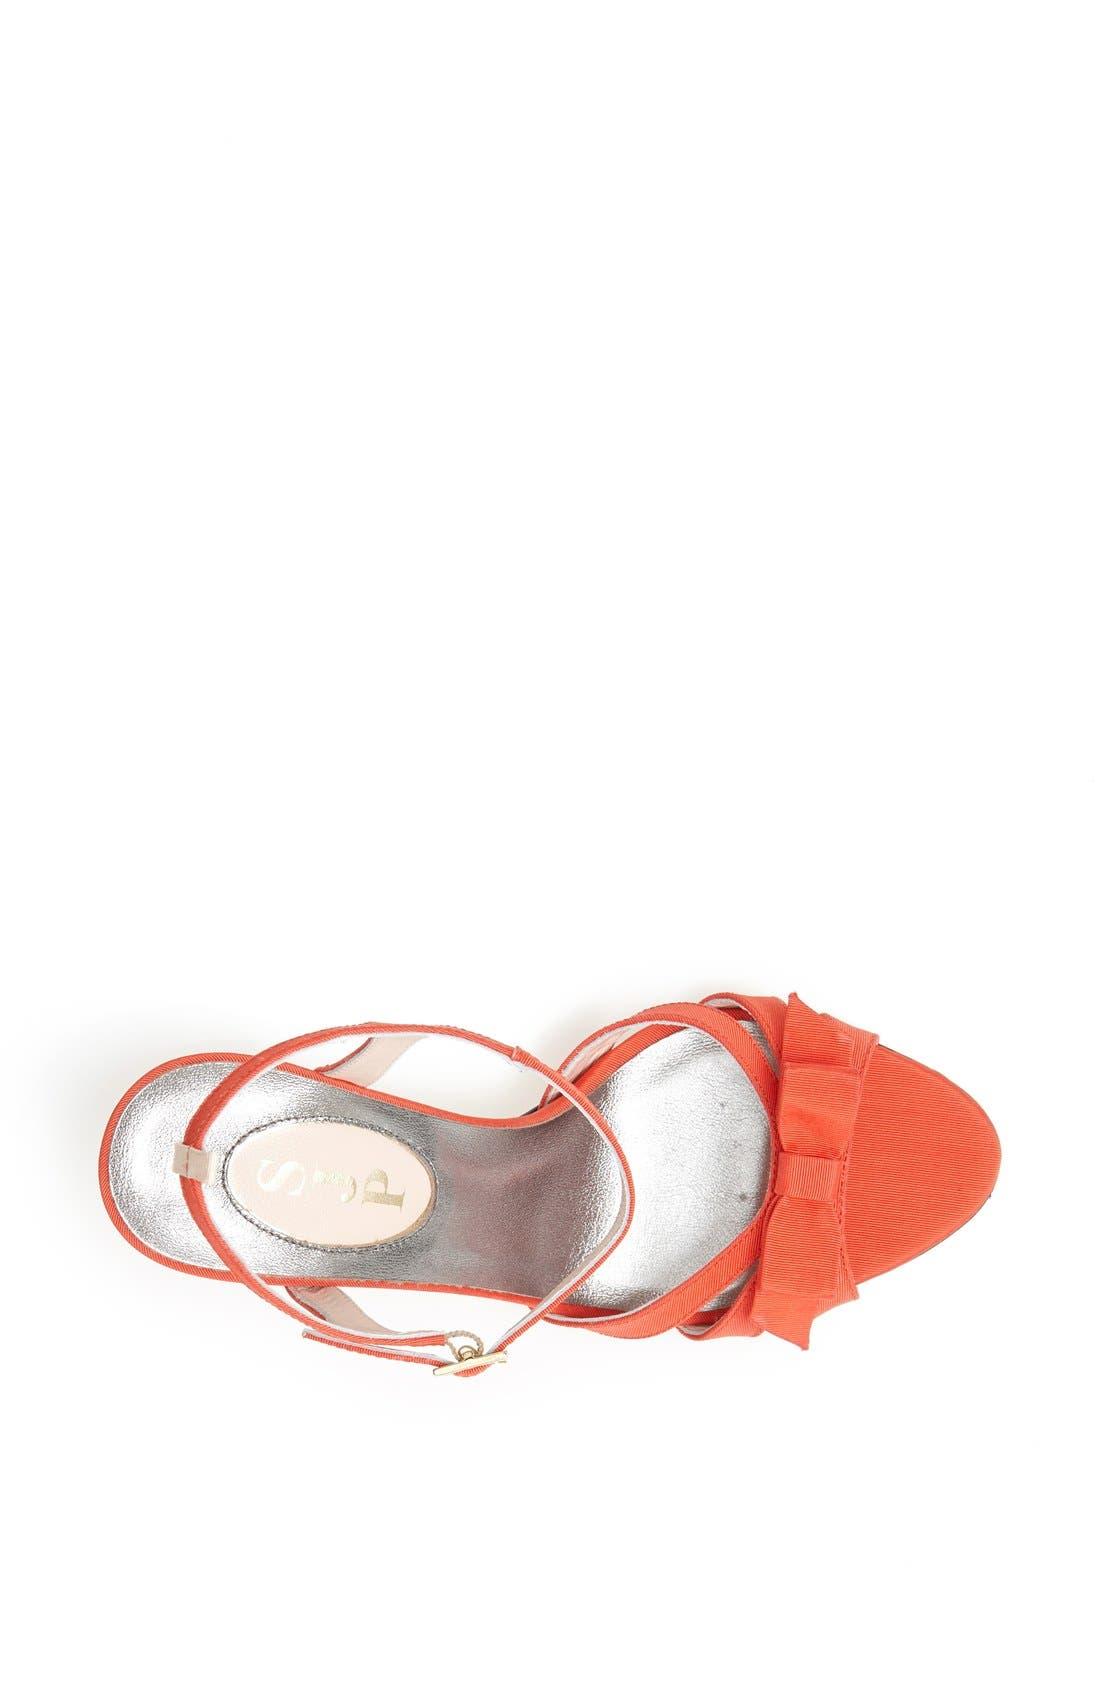 Alternate Image 3  - SJP 'Silvia' Grosgrain Ankle Strap Sandal (Nordstrom Exclusive)